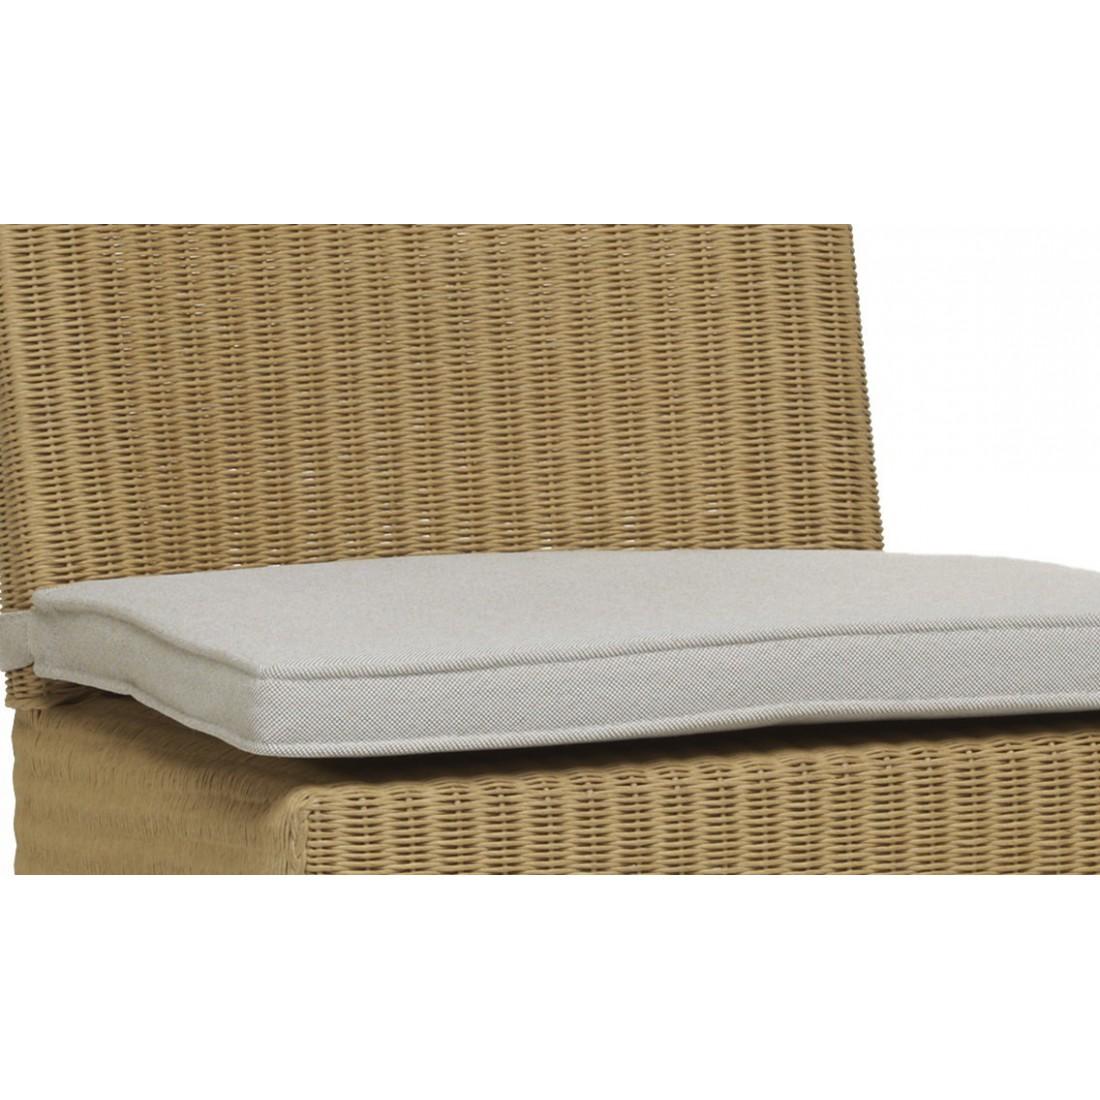 coussin seul pour tabouret de bar c sar en lloyd loom. Black Bedroom Furniture Sets. Home Design Ideas